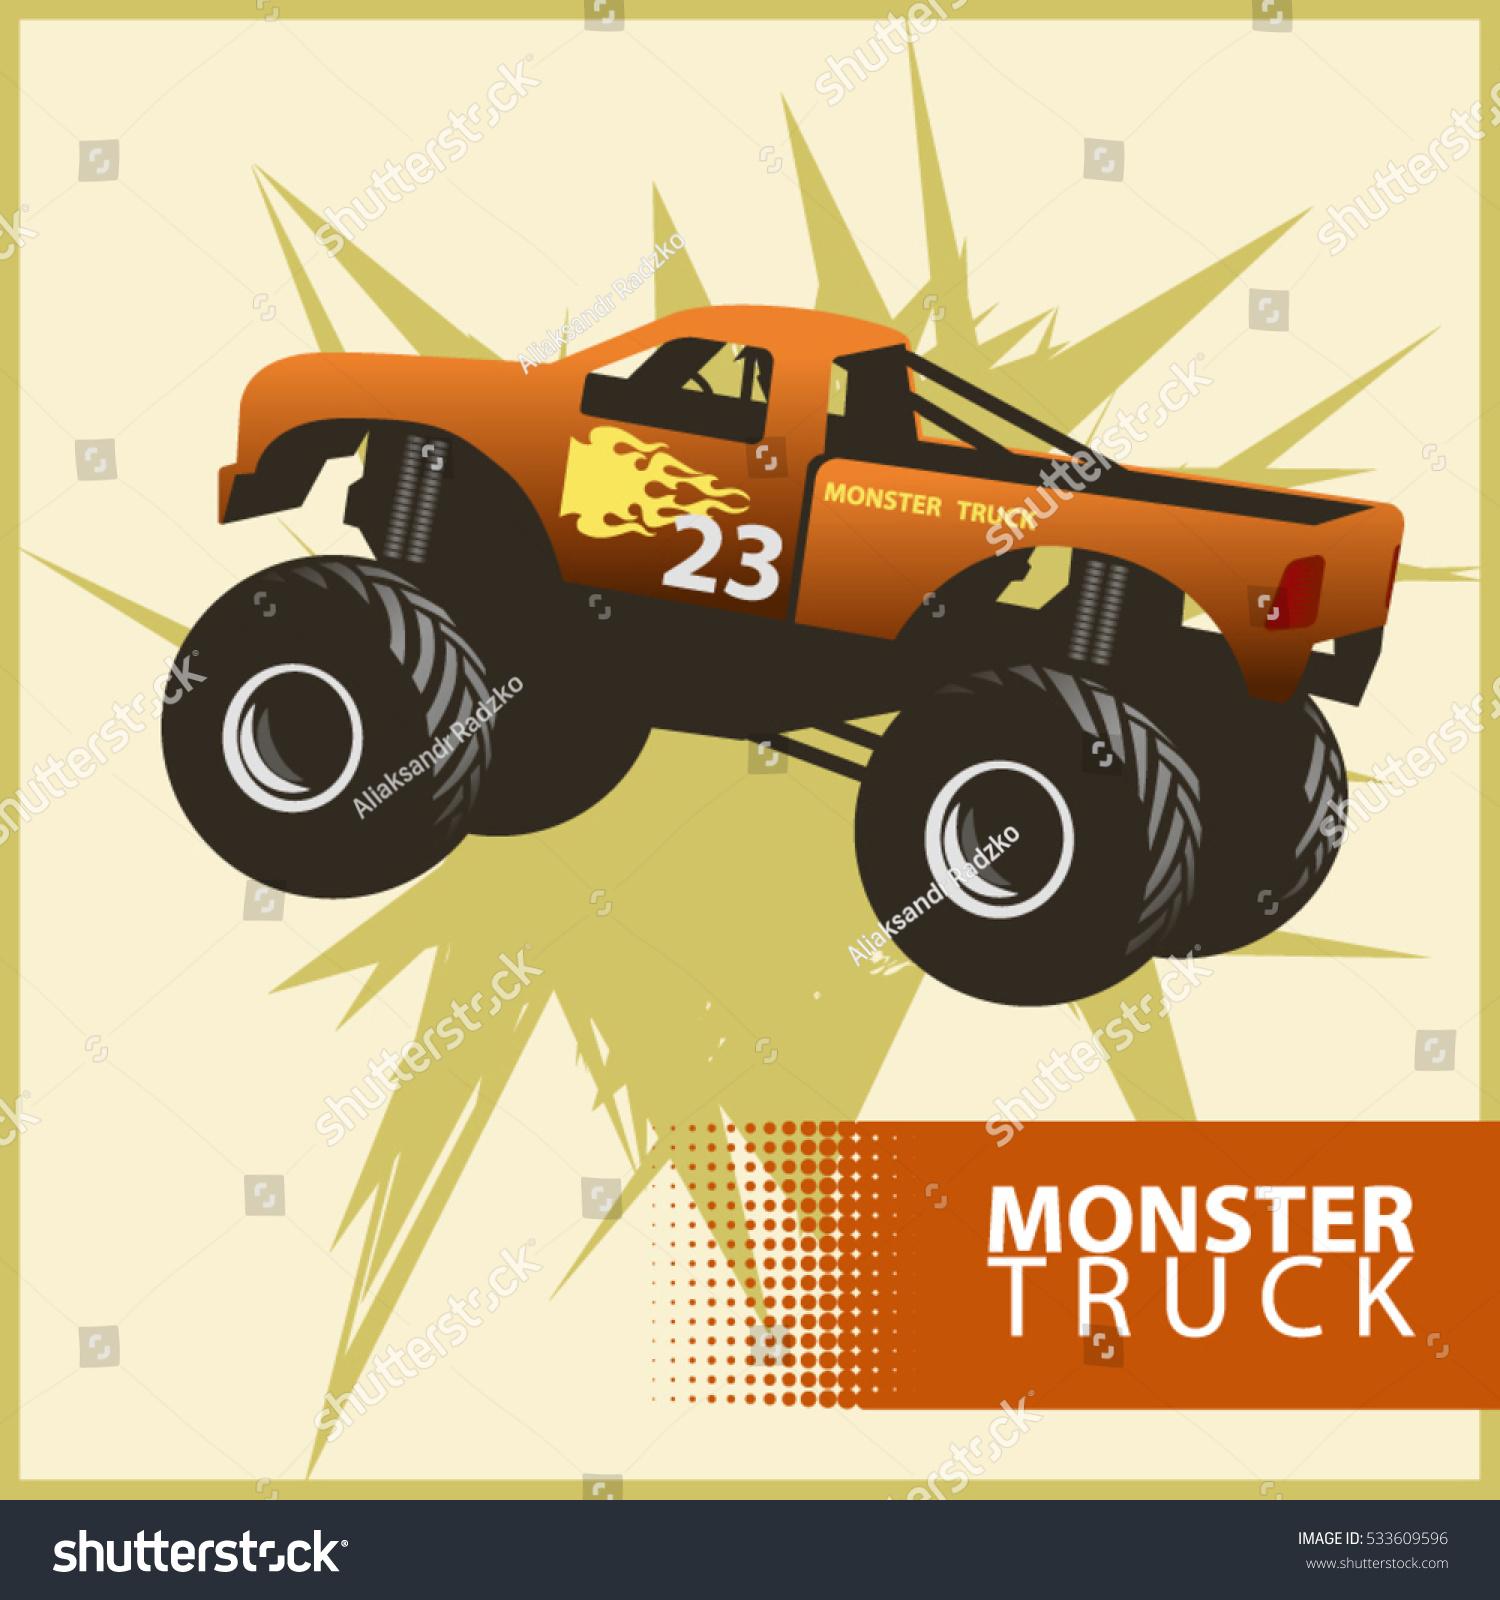 Vector Orange Monster Truck Flames On Stock Vector (Royalty Free ...